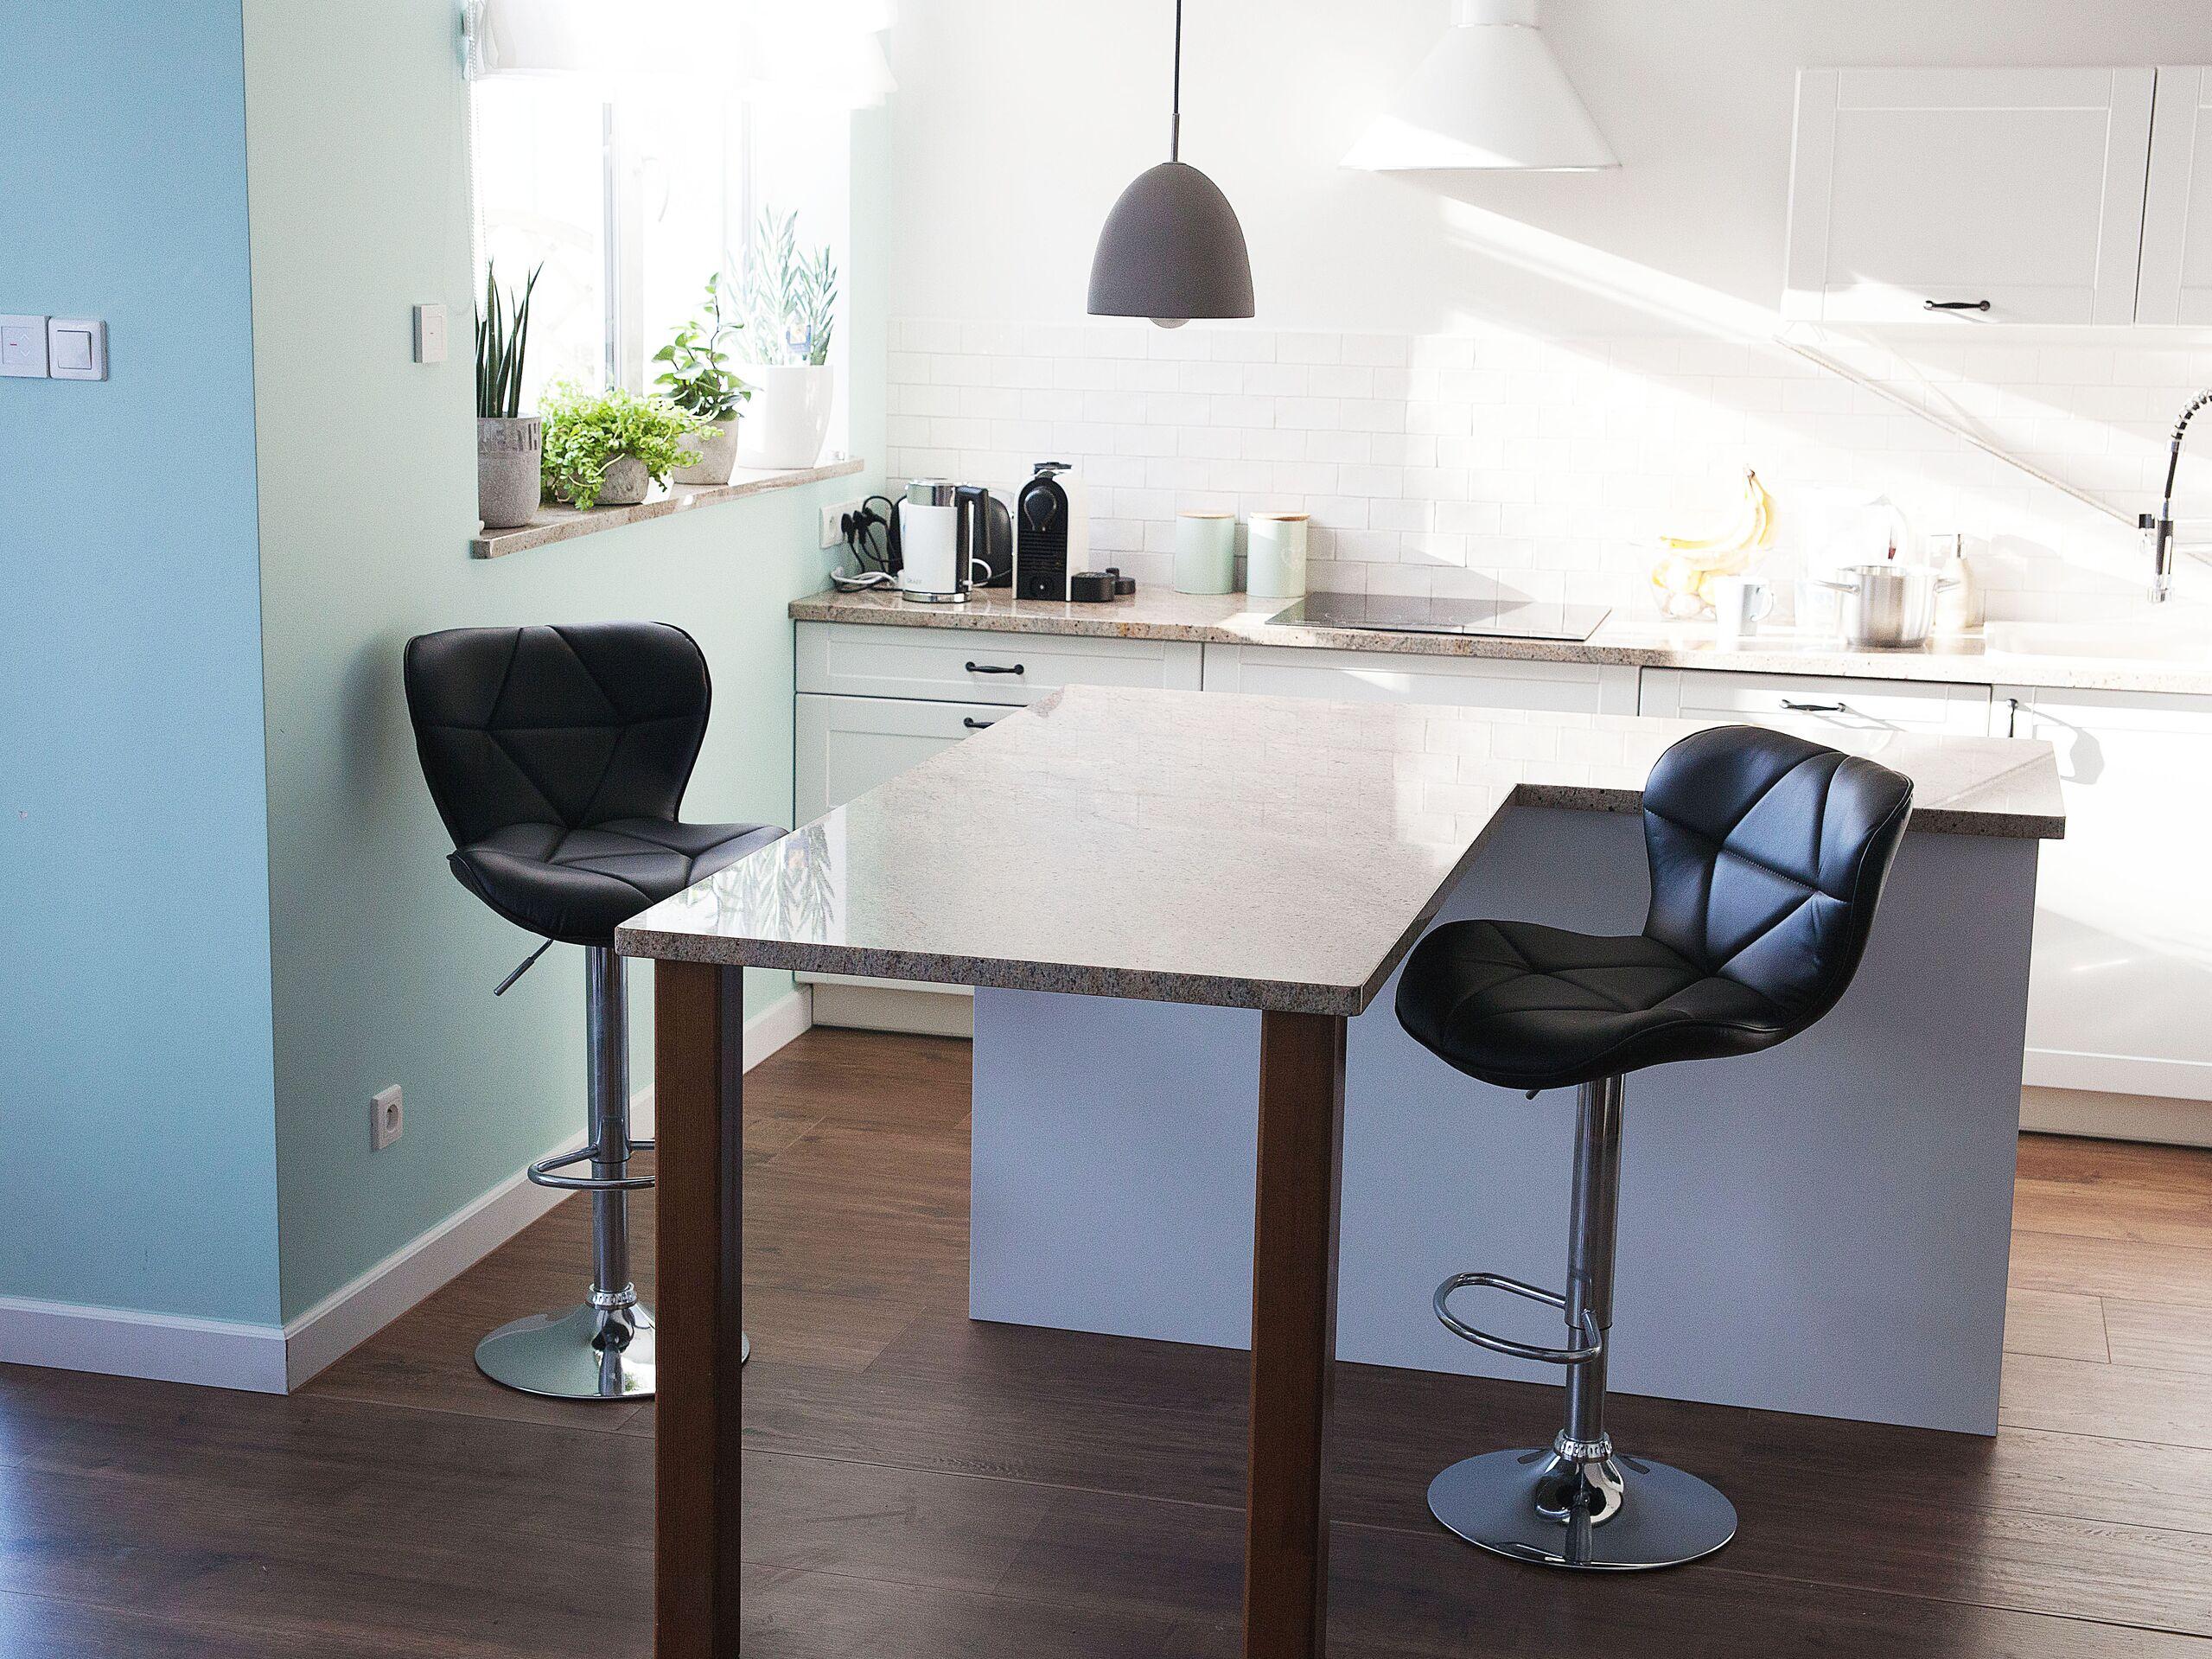 Lot de 2 chaises de bar en simili-cuir noir